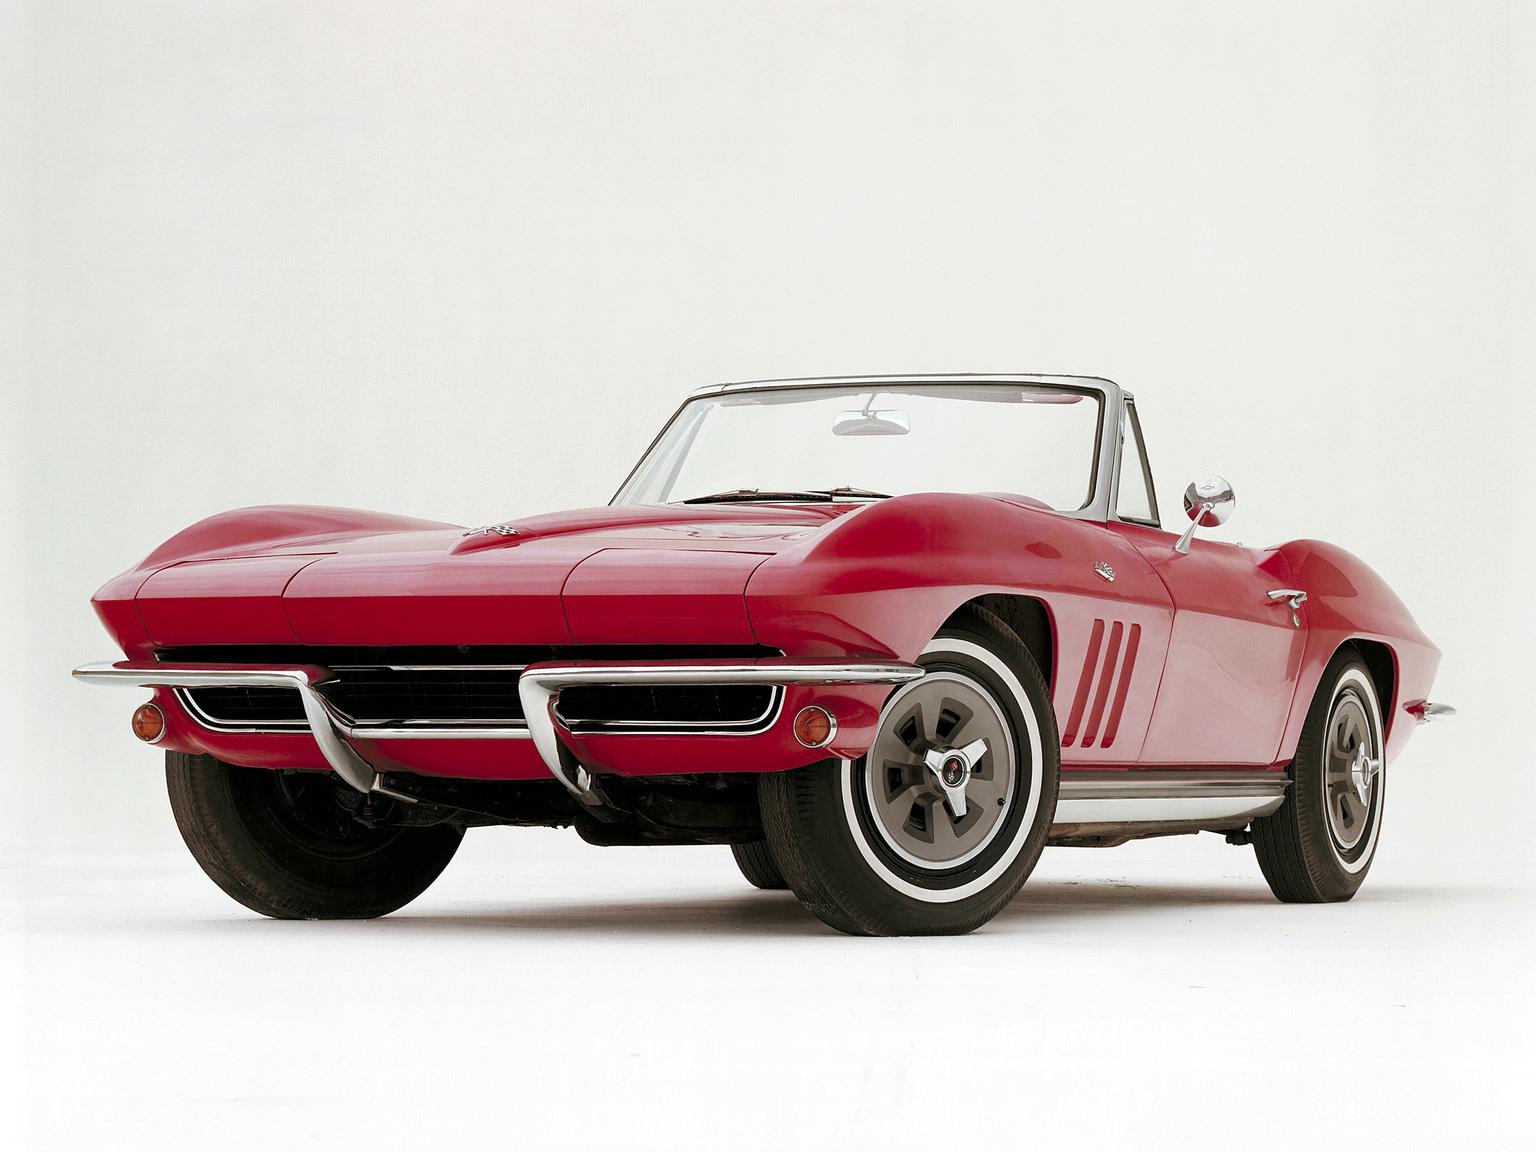 1965 Chevrolet Corvette Sting Ray Convertible L84 327/375 HP